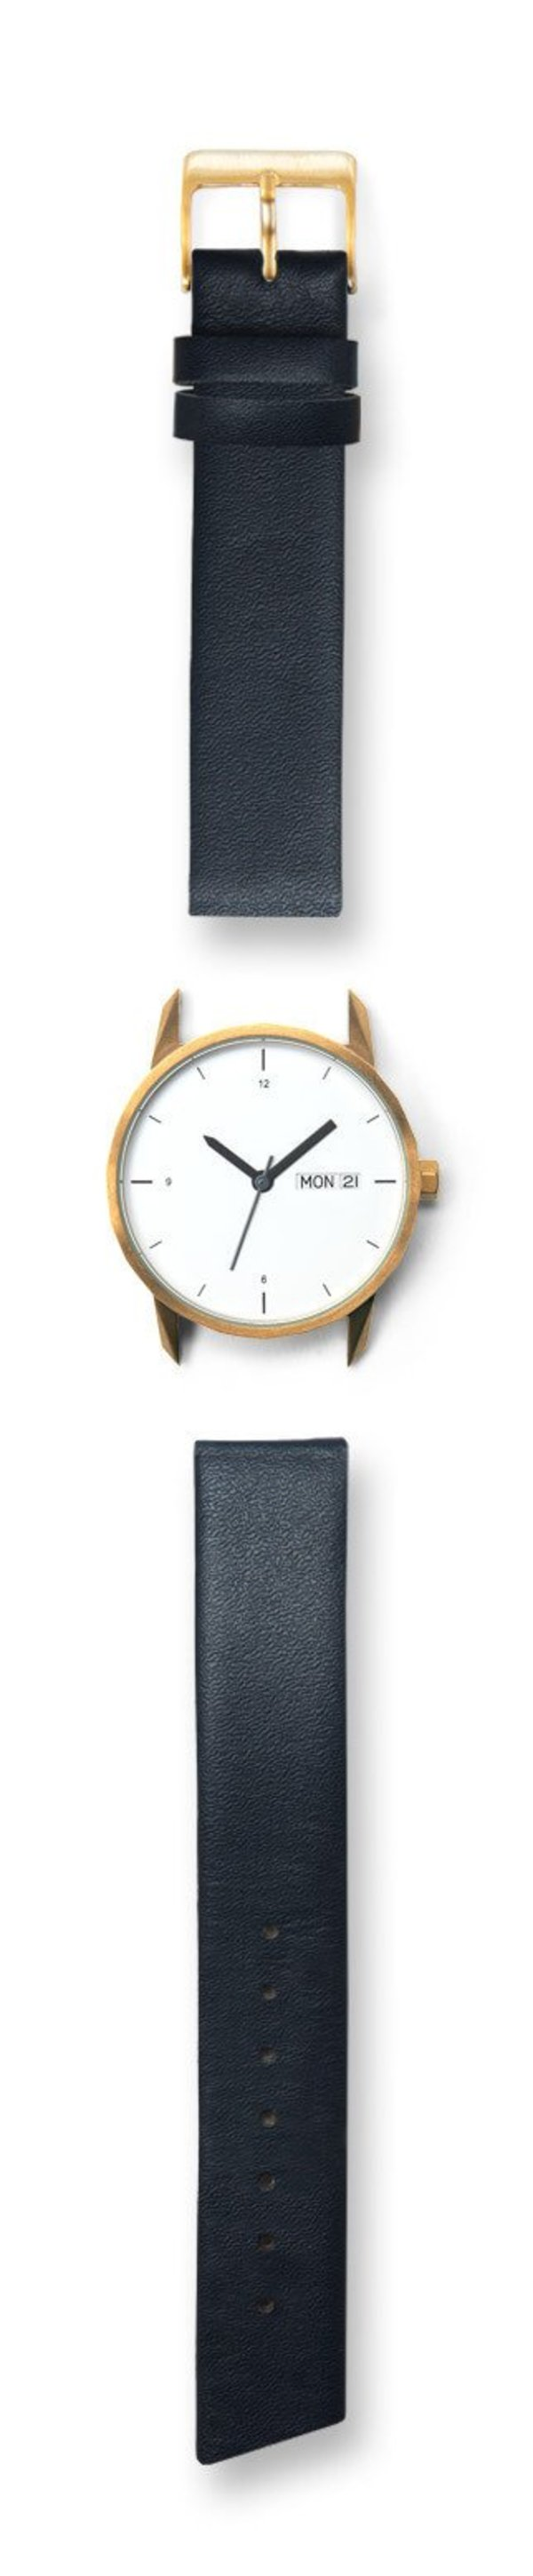 Unisex Tinker Watches 34mm Gold Watch Navy Strap